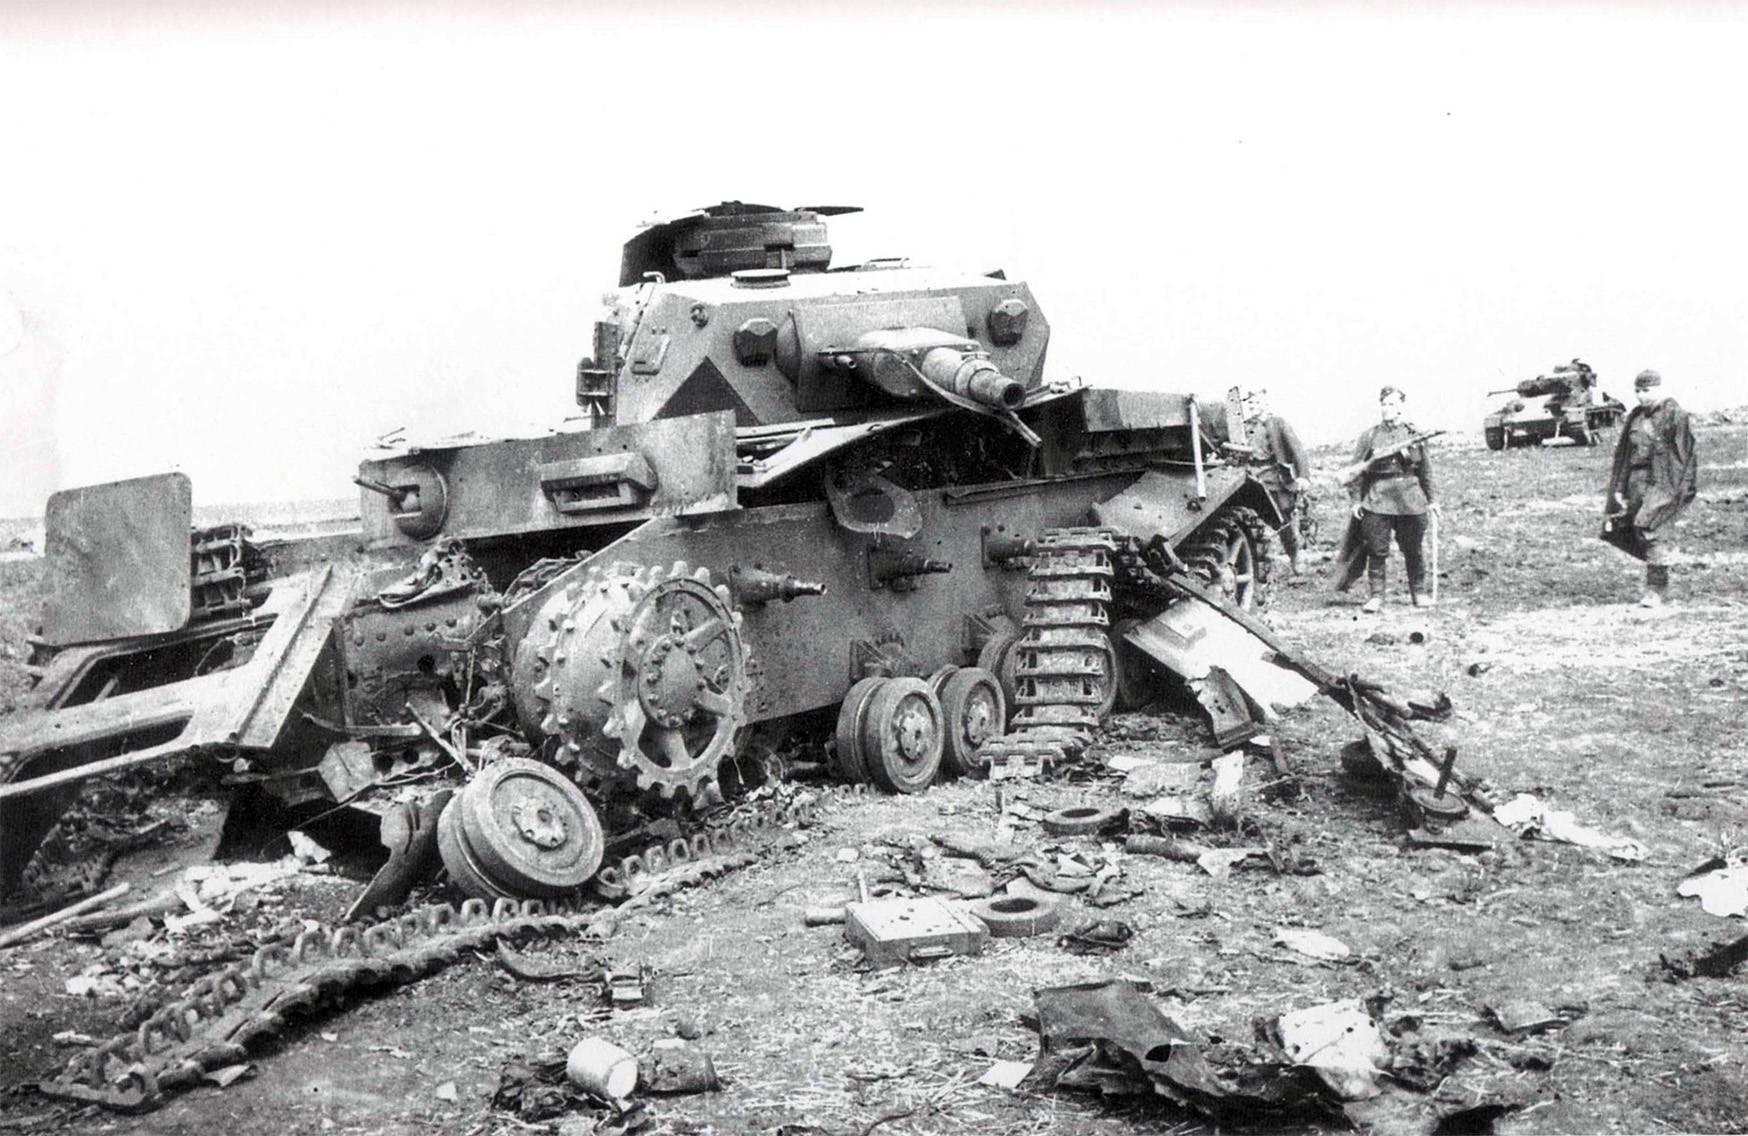 76-мм пушка обр. 1942 г. (зис-3)